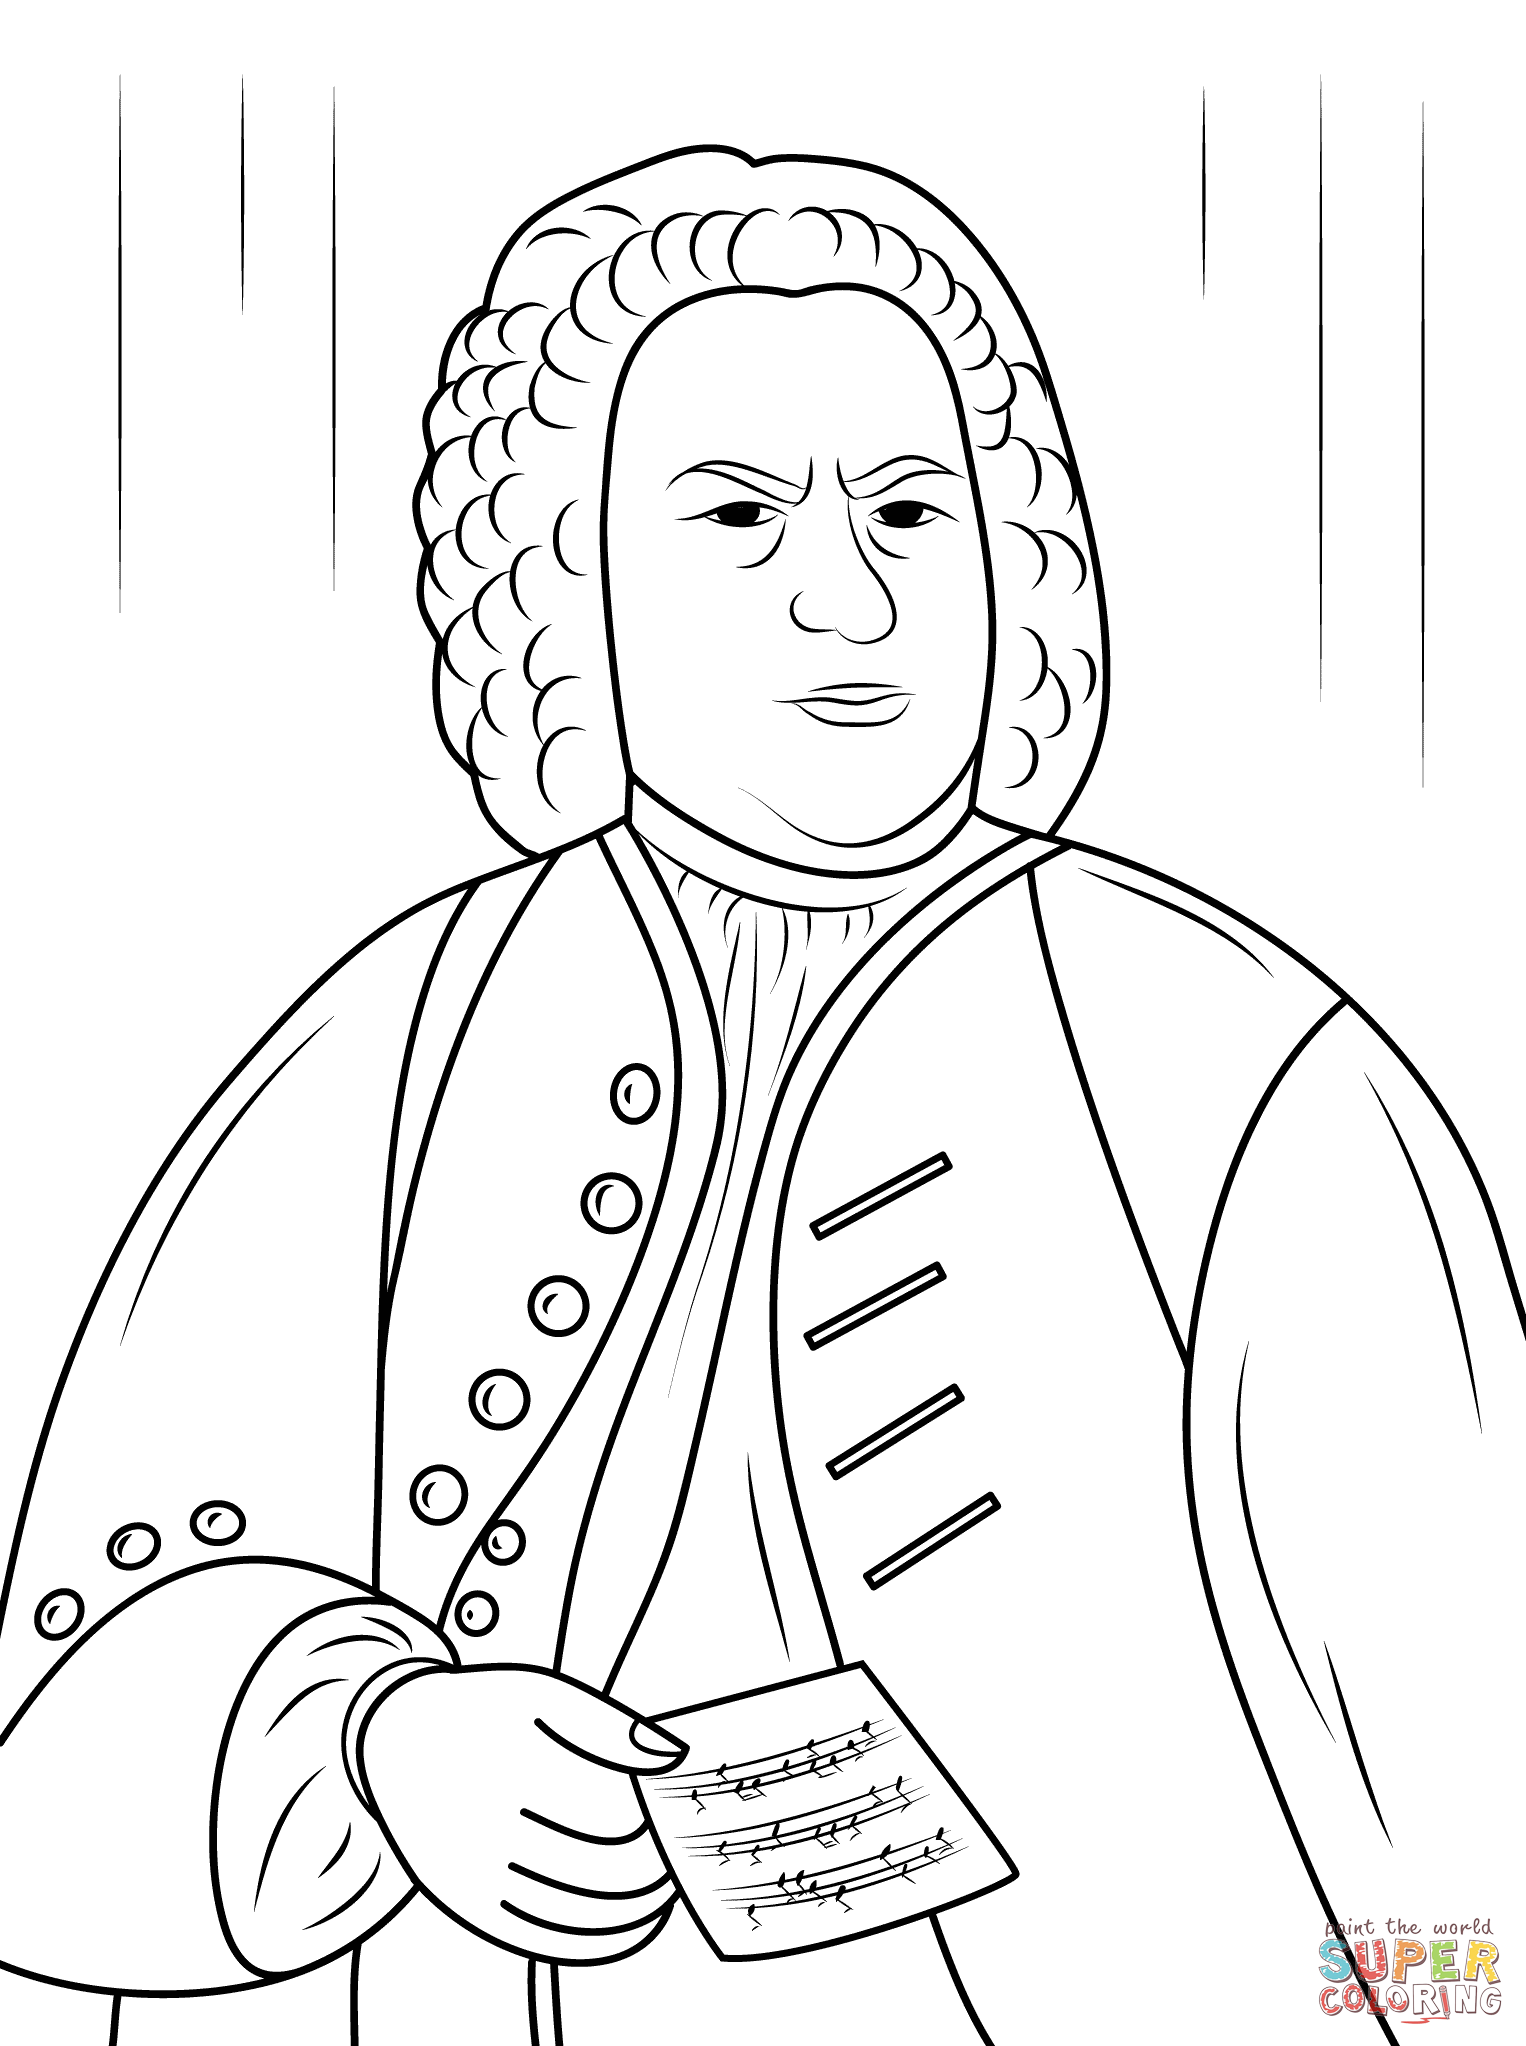 Johann Sebastian Bach Coloring Pages 1 526 2 046